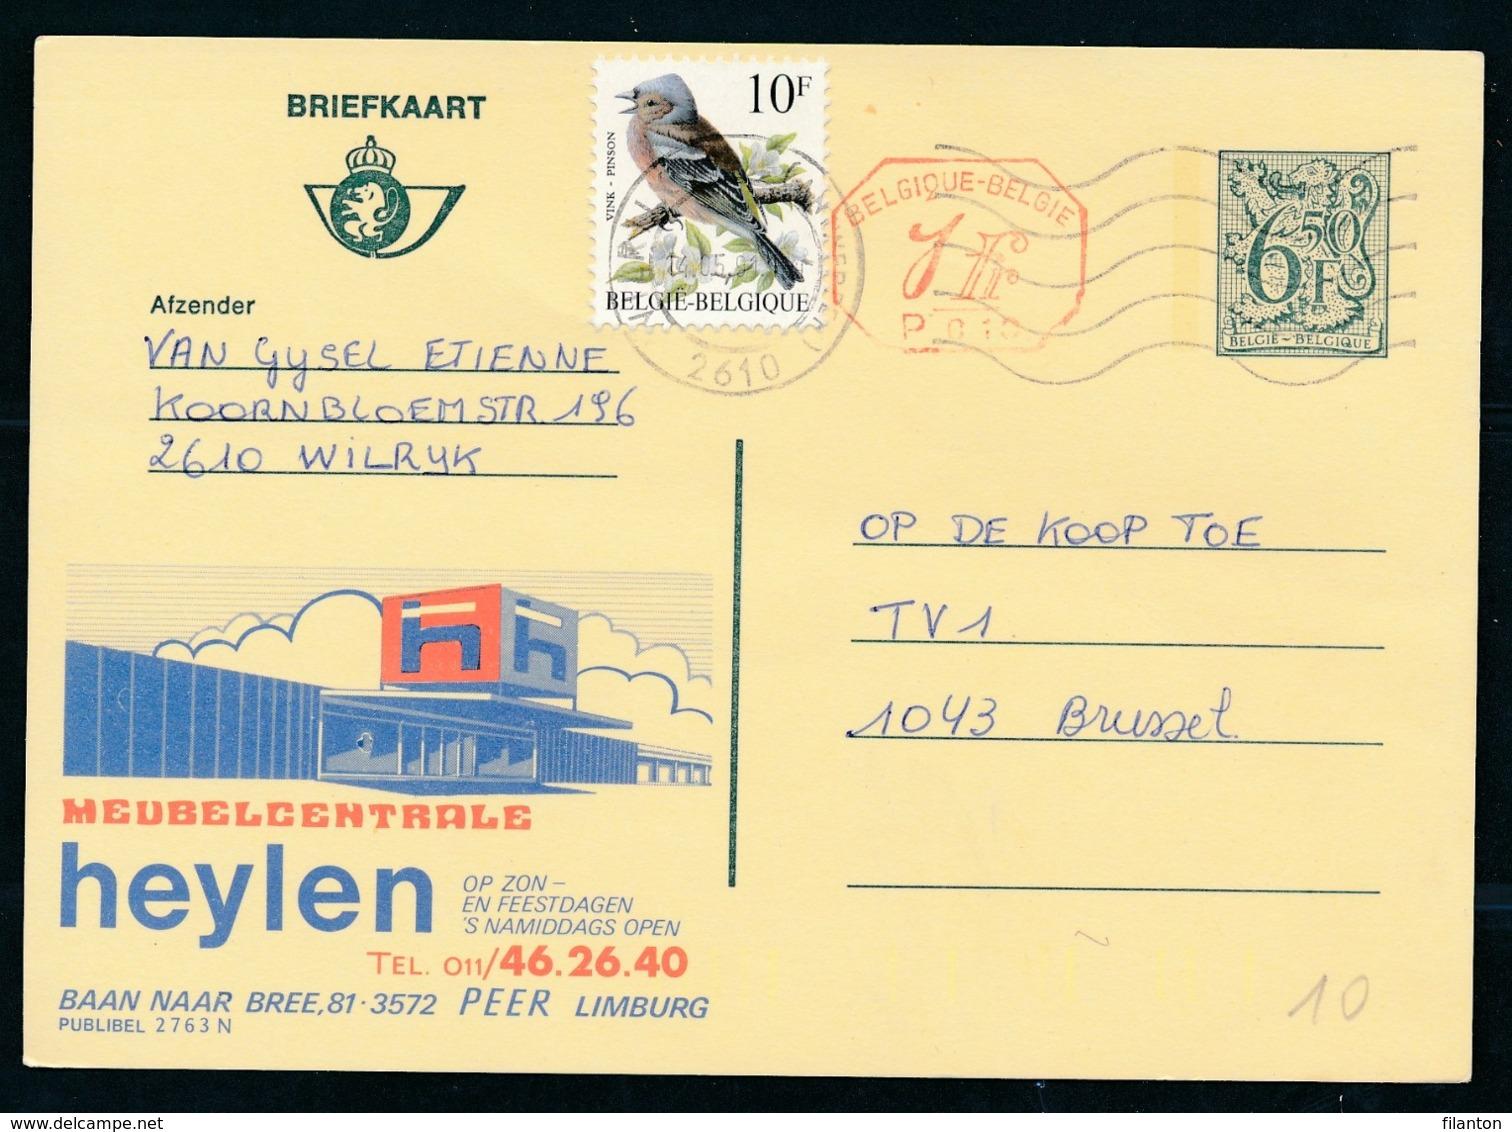 PUBLIBEL Nr 2763N - Meubelcentrale Heylen - Stamped Stationery